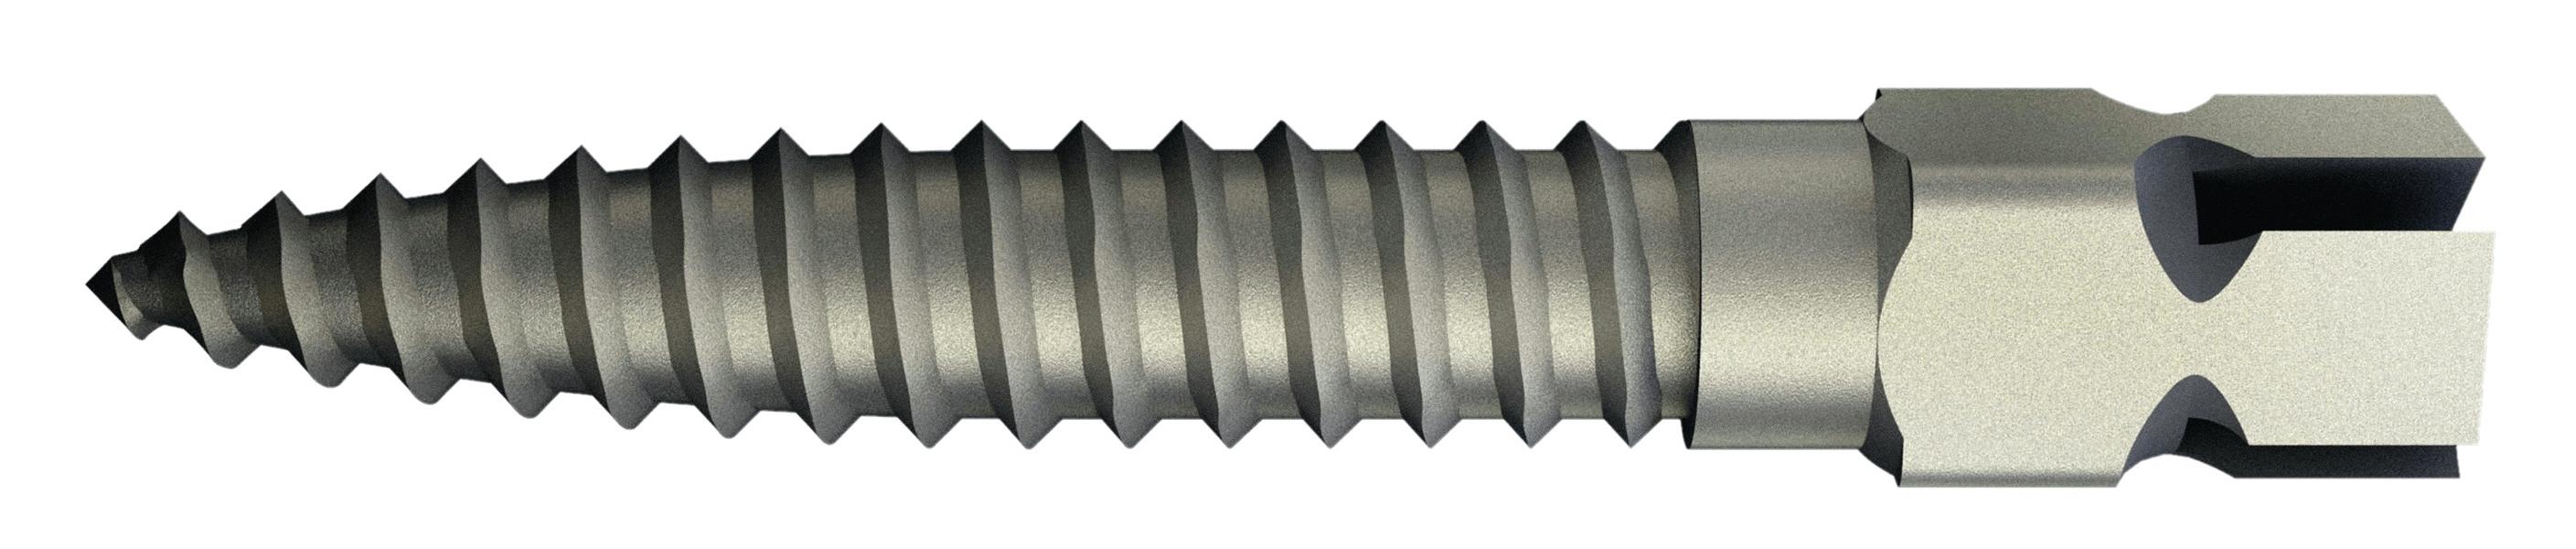 Tenons Surtex Inox Recharge tenon court (Longueur  7,8 mm) Dentatus 170512